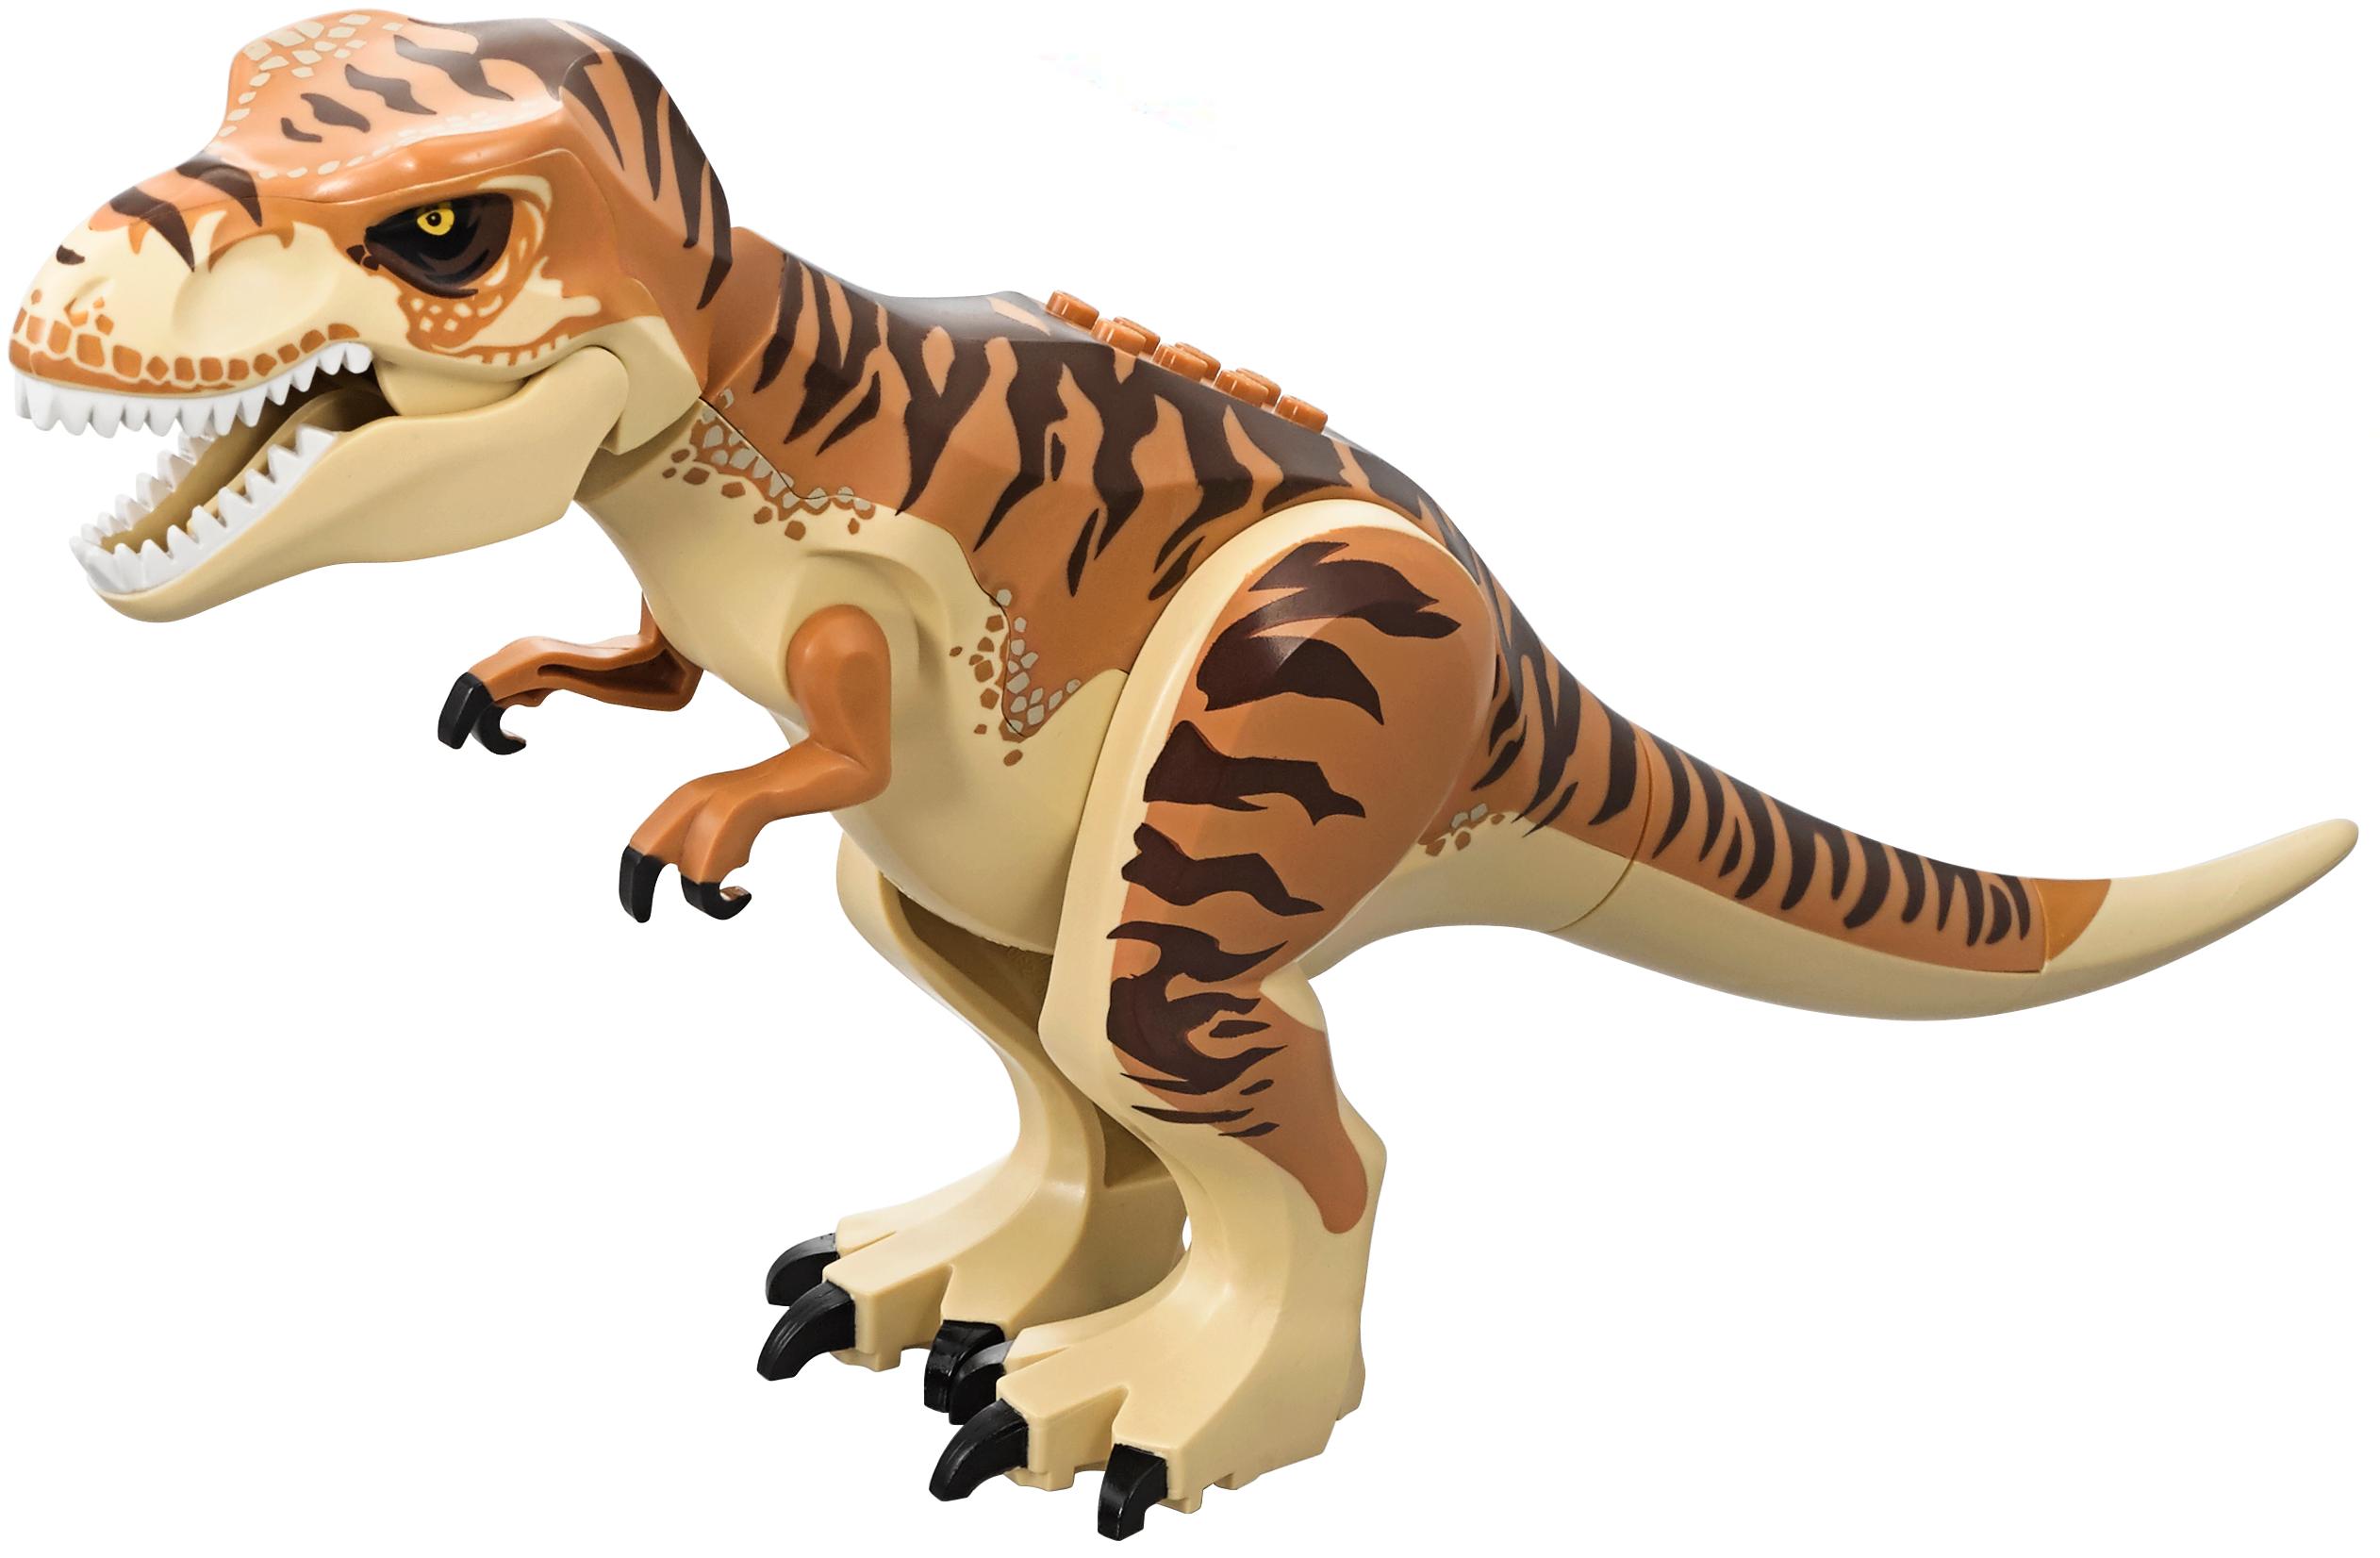 Tyrannosaurus Rex Isla Nublar Toys Lego Jurassic World Jurassic World T Rex Lego News